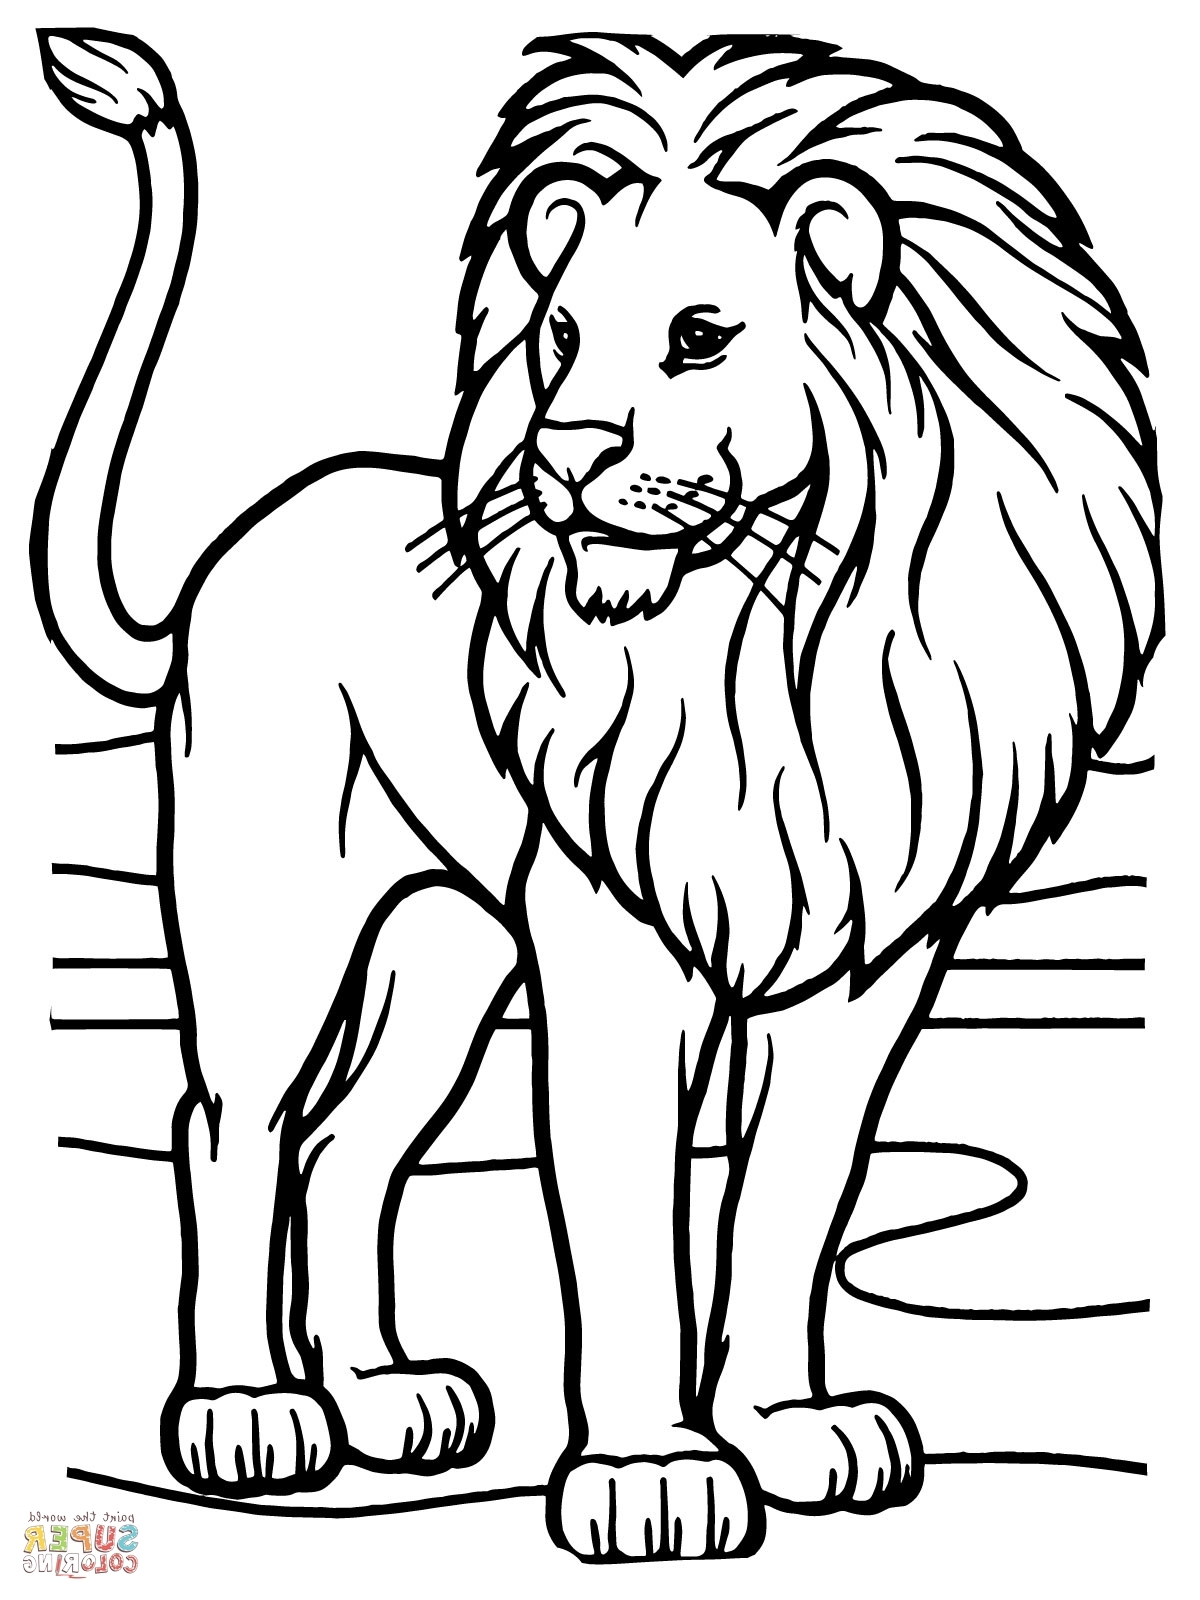 Rasta Lion Drawing at GetDrawings.com | Free for personal use Rasta ...